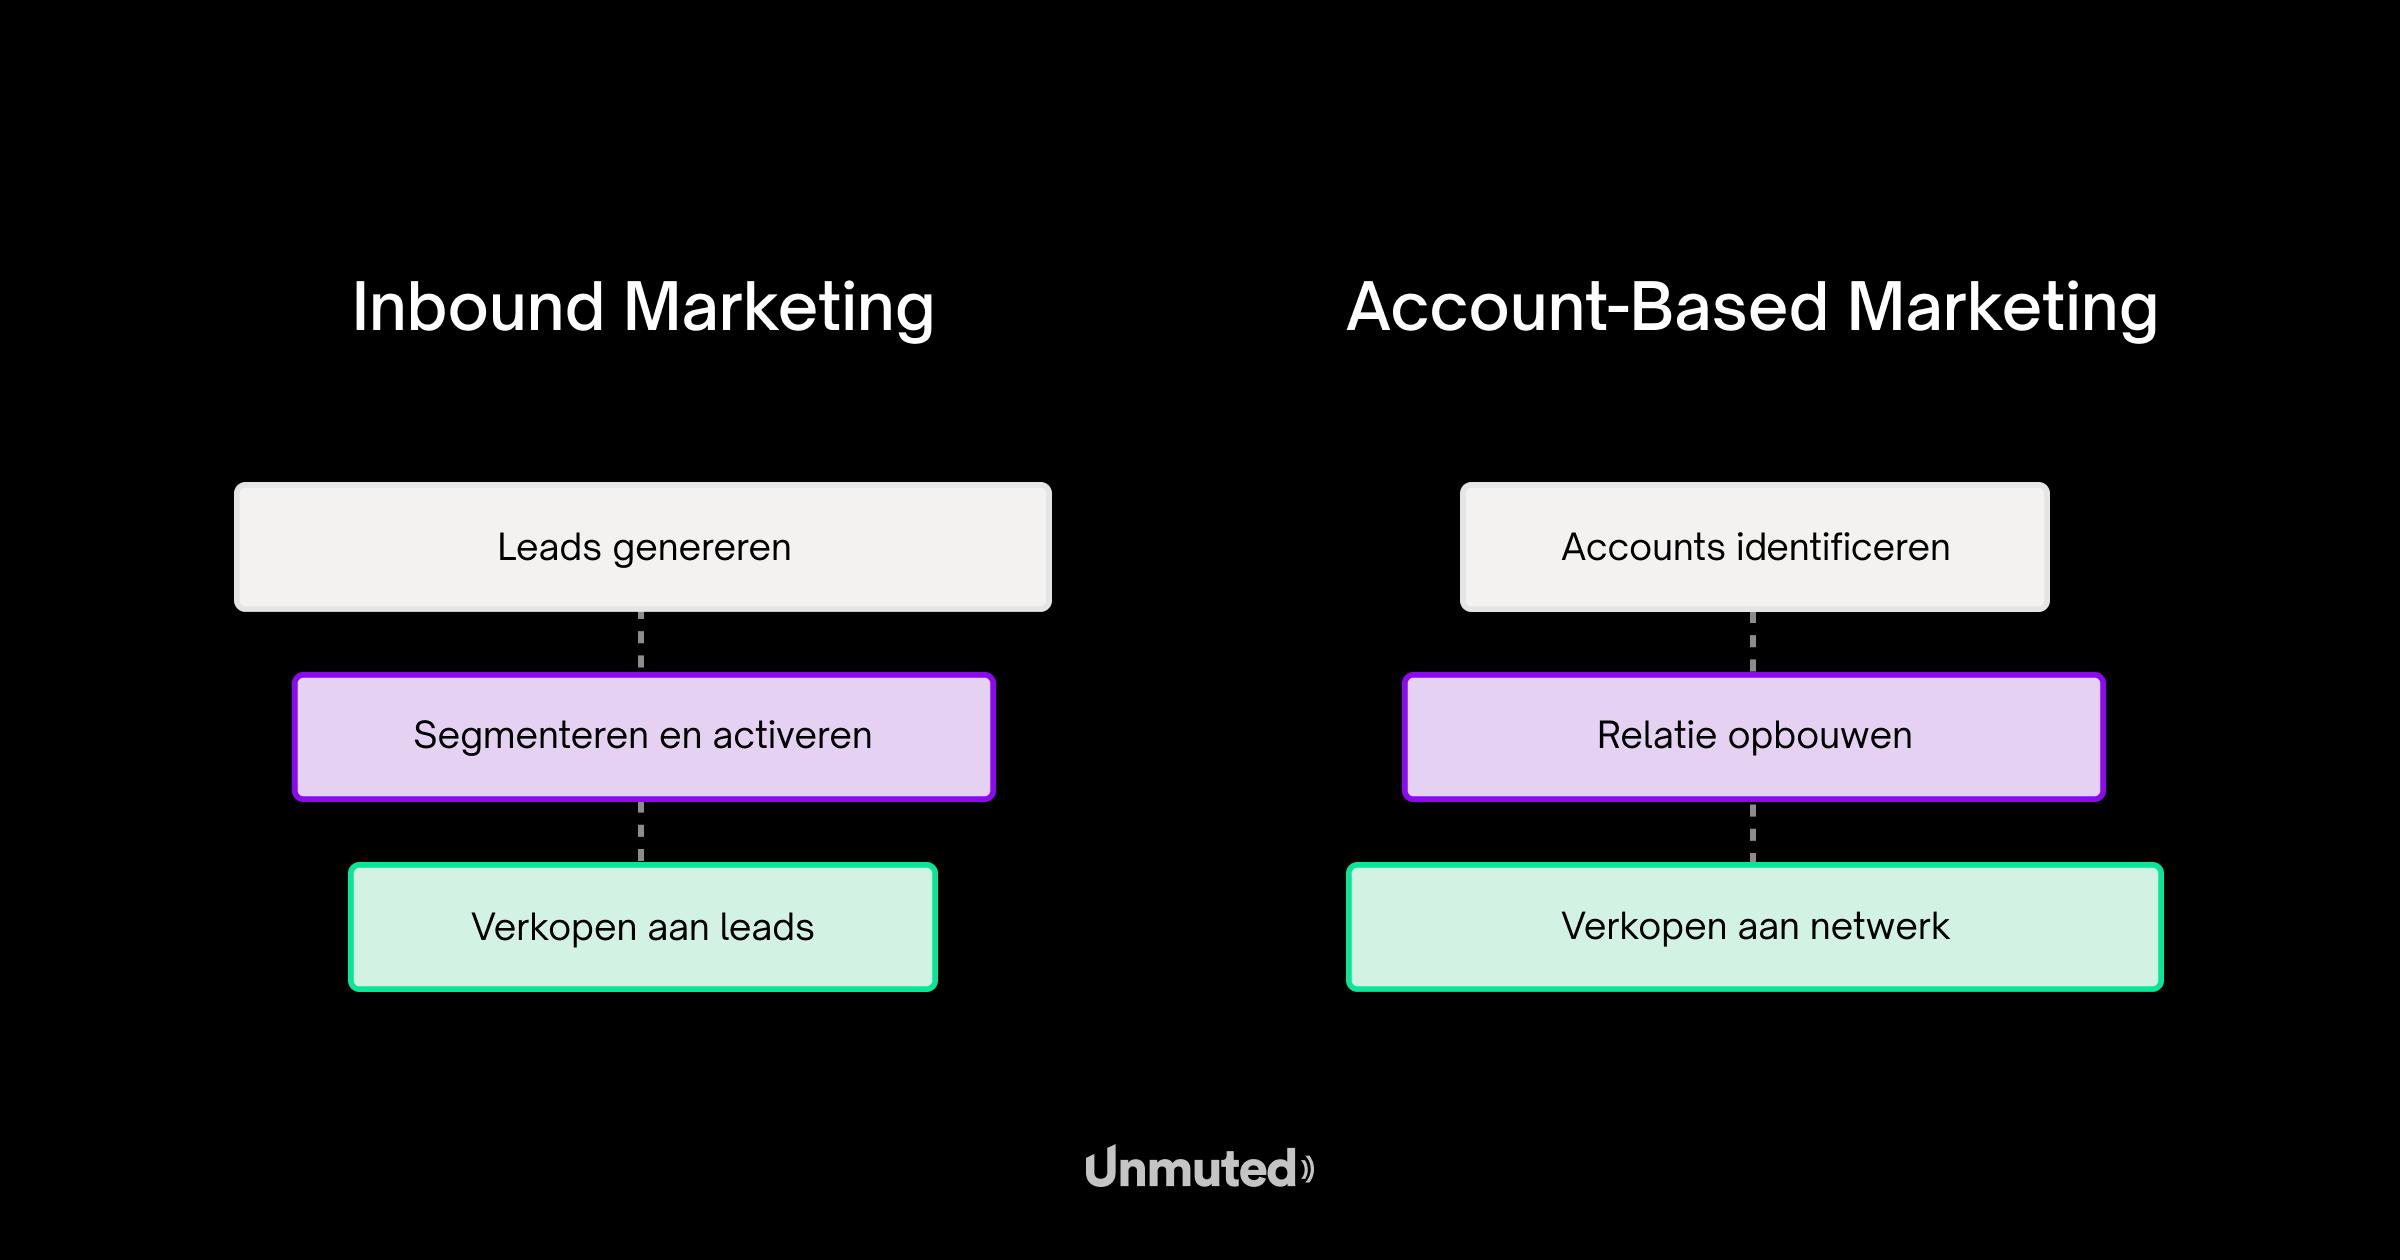 inbound-marketing-vs-account-based-marketing